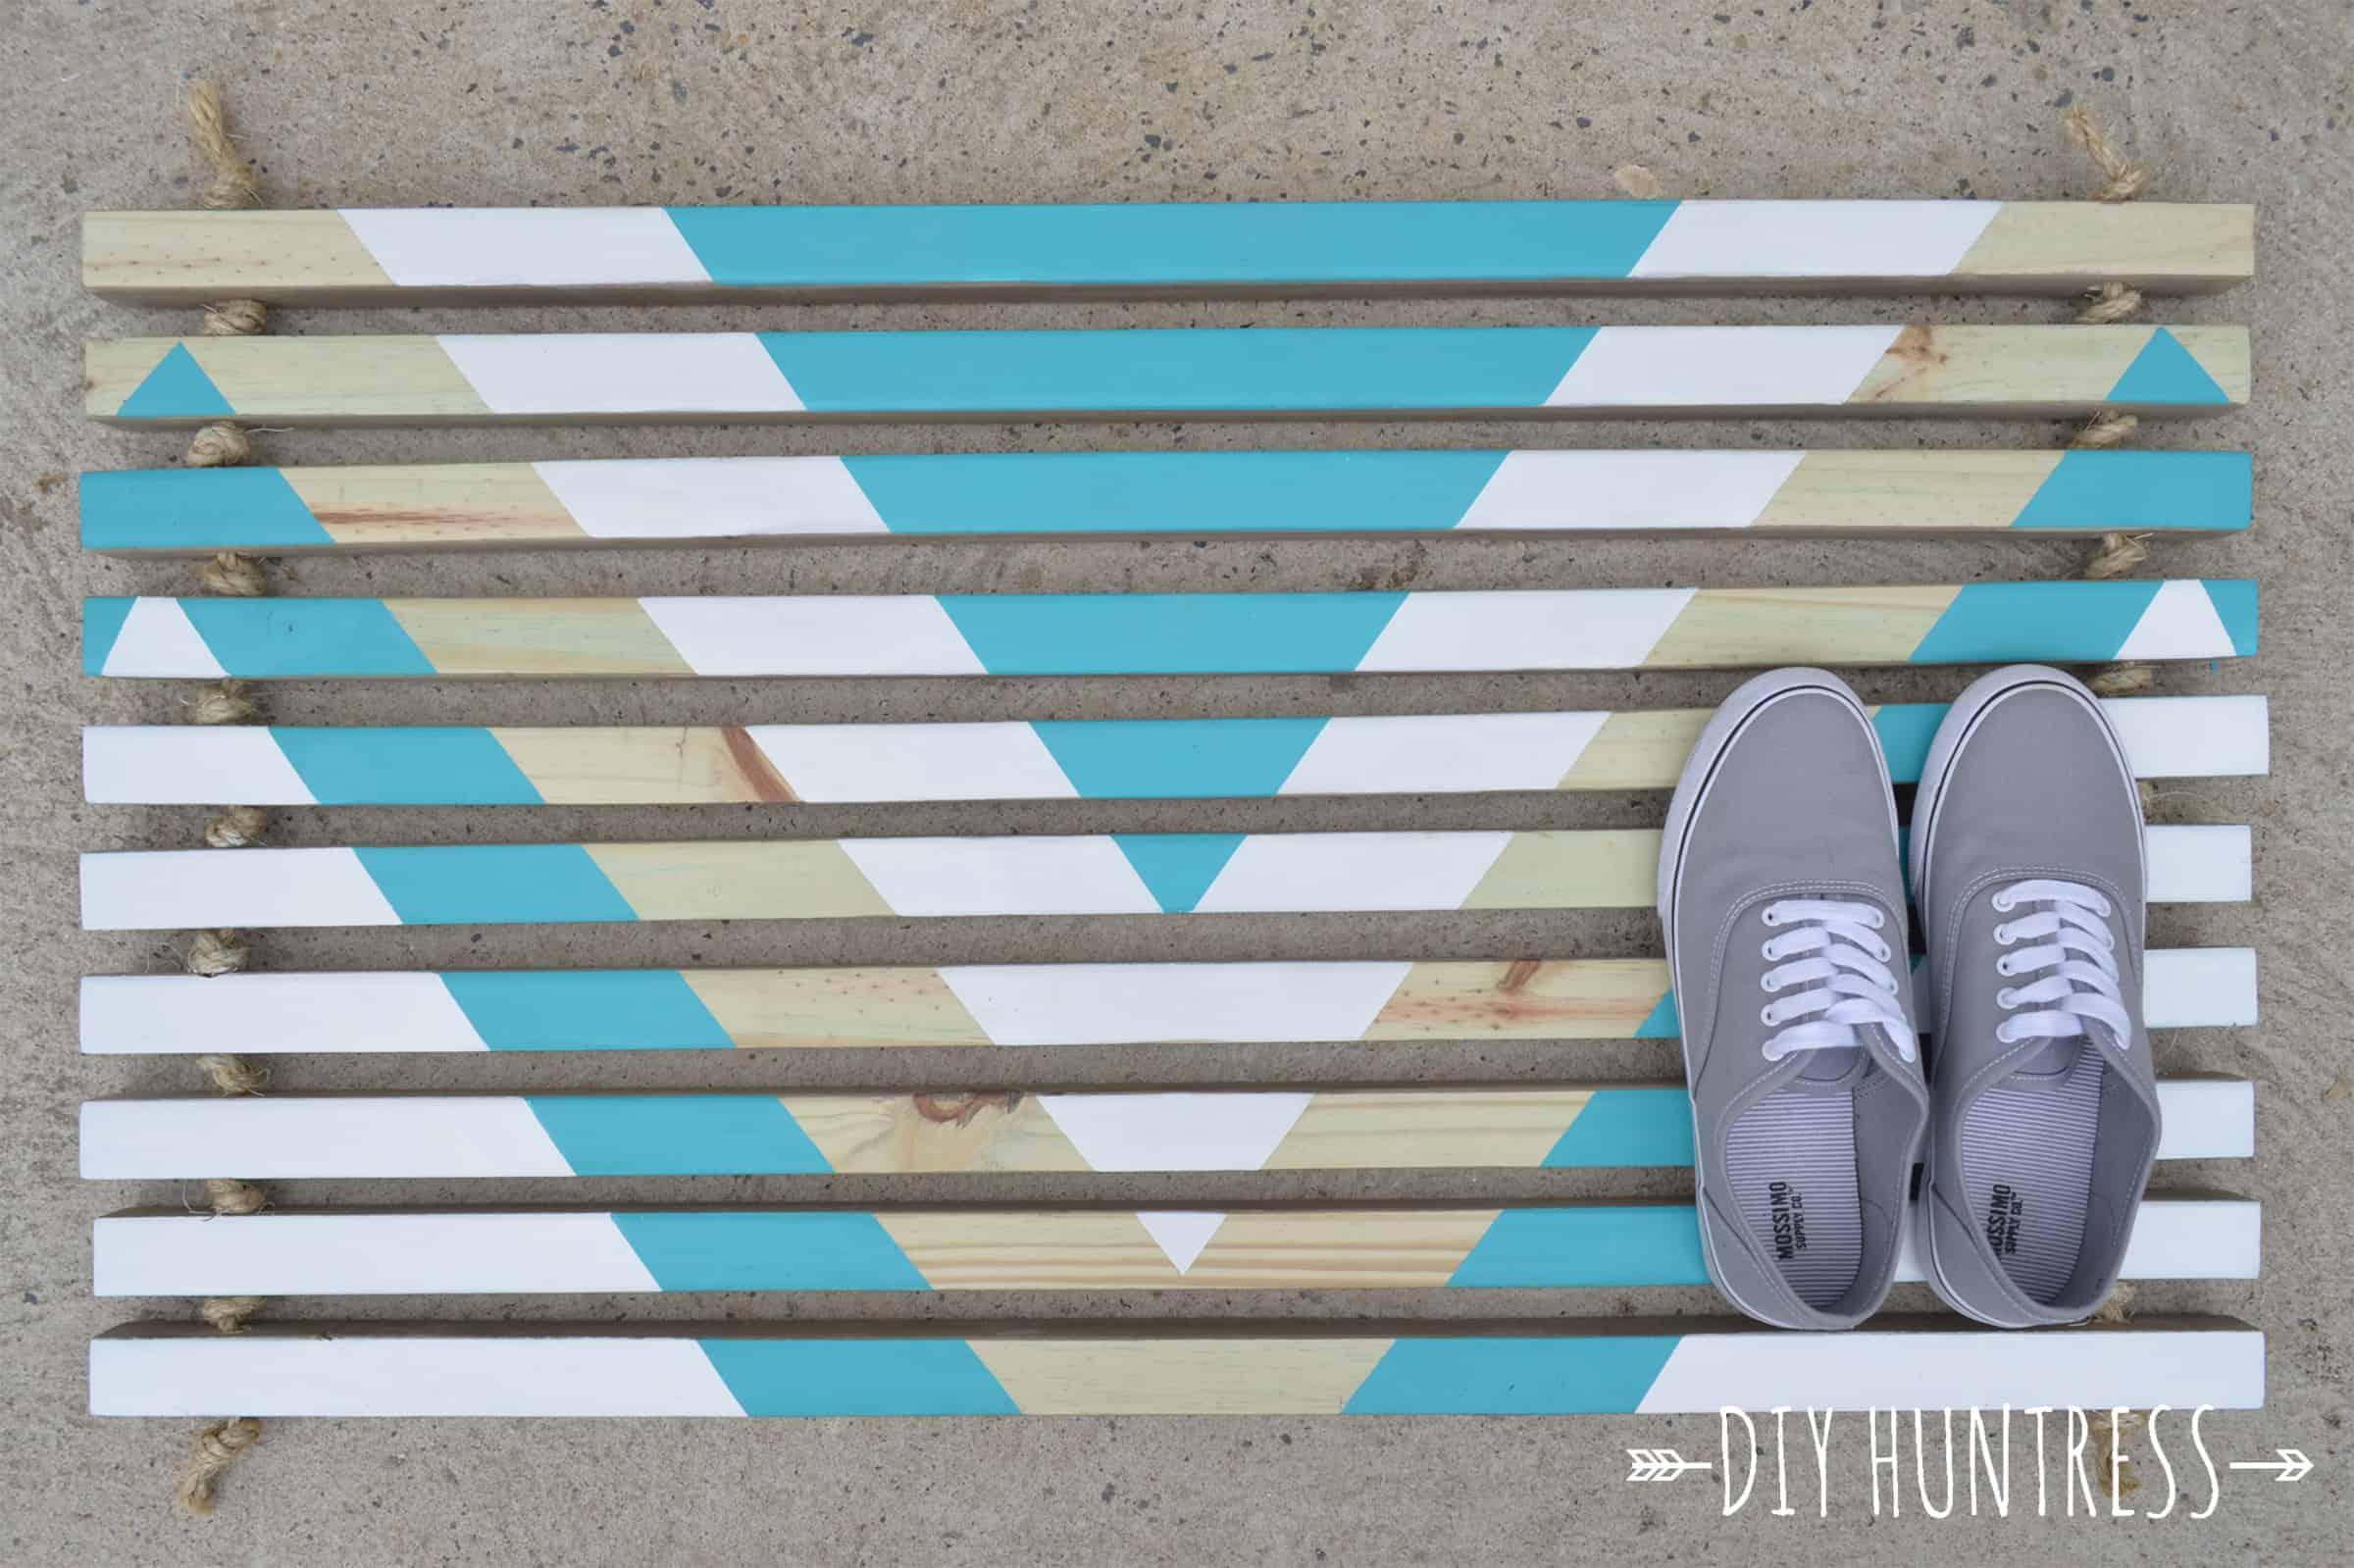 DIY_Huntress_Doormat_Home_Depot-15